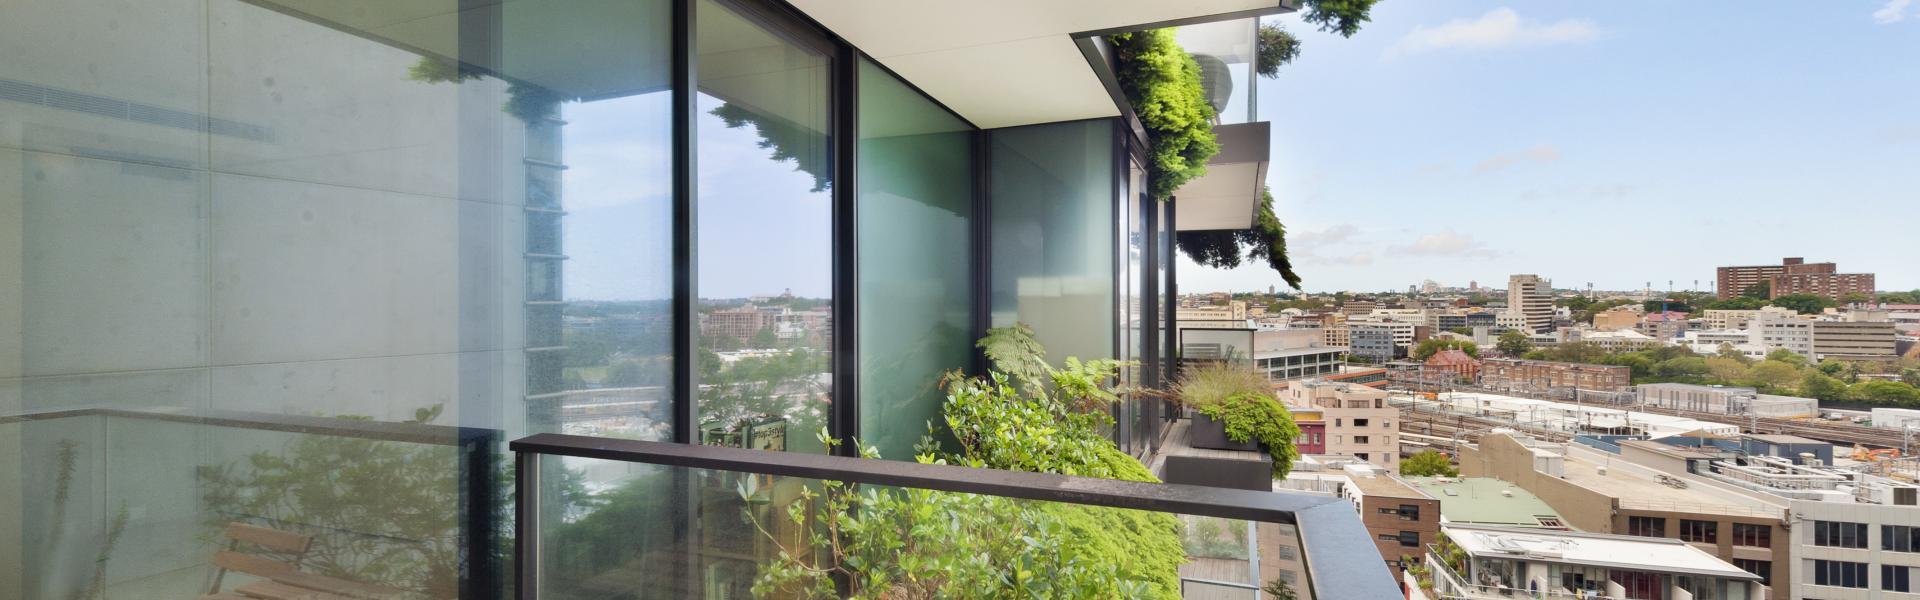 2 Bed Dual Key, Vertical Gardens, Award Winning Building